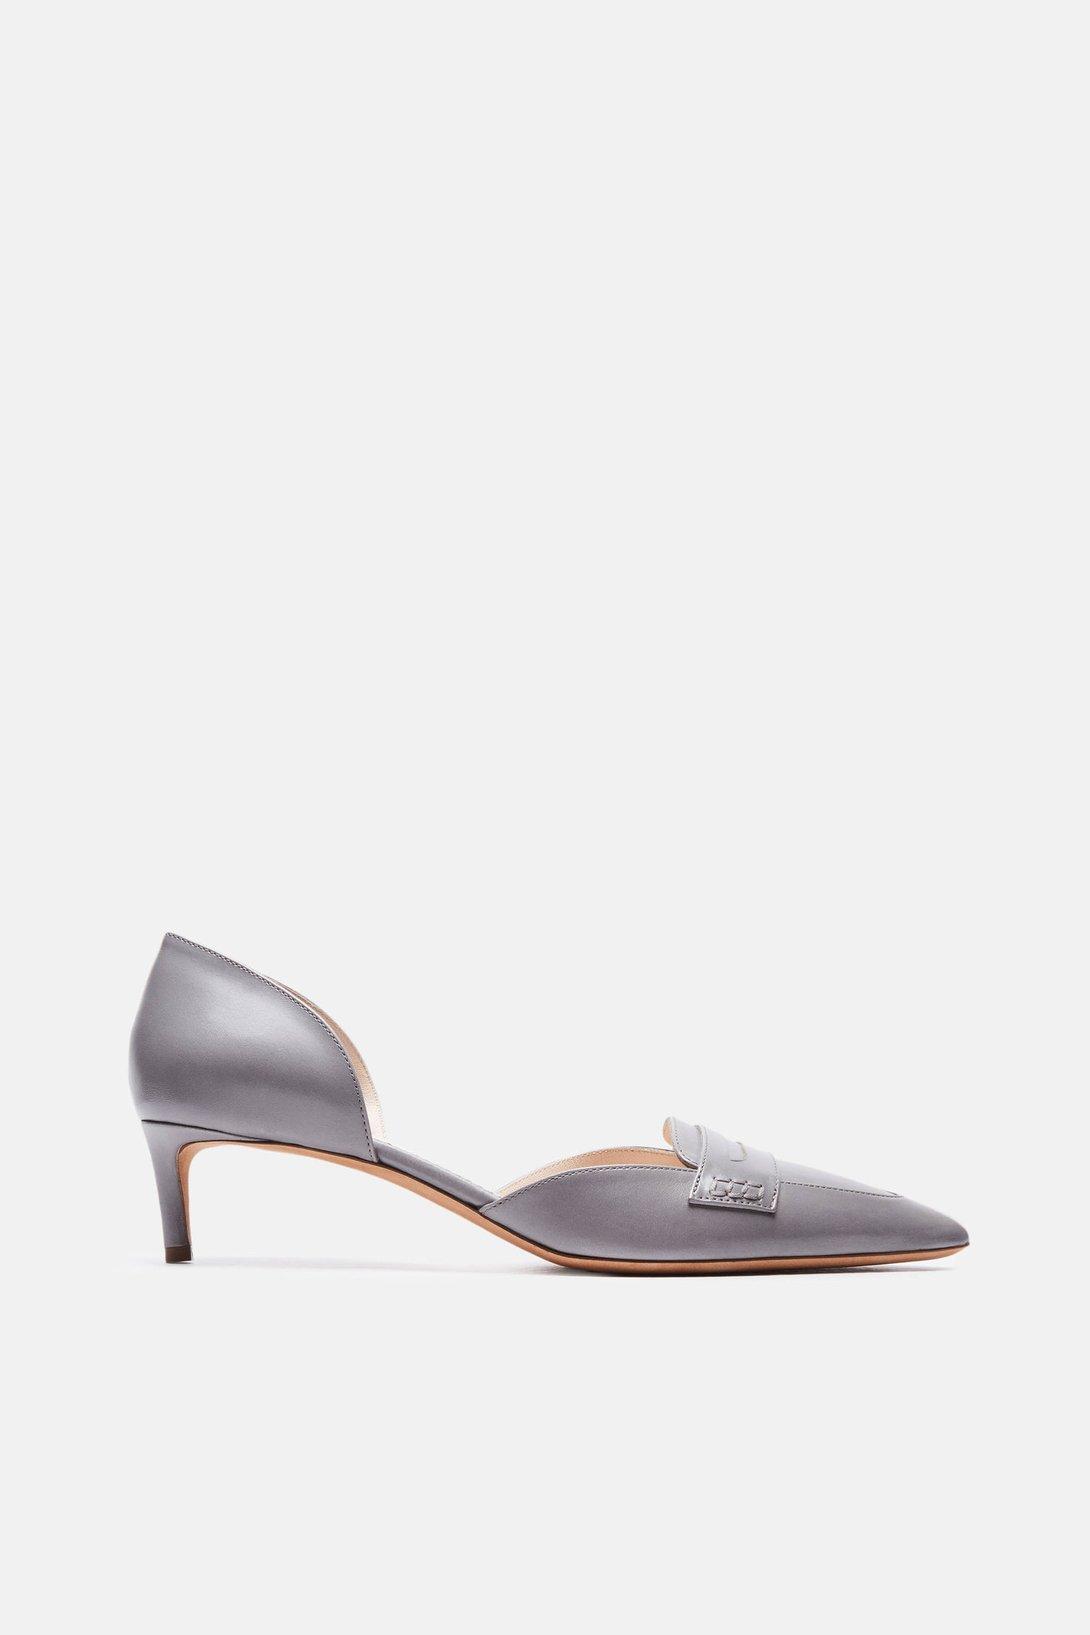 0db92296379 Shop Altuzarra Bancroft Kitten Heel in Charcoal from The Best of NYC Designer  Sample Sale Women s Shoes Sample Sale